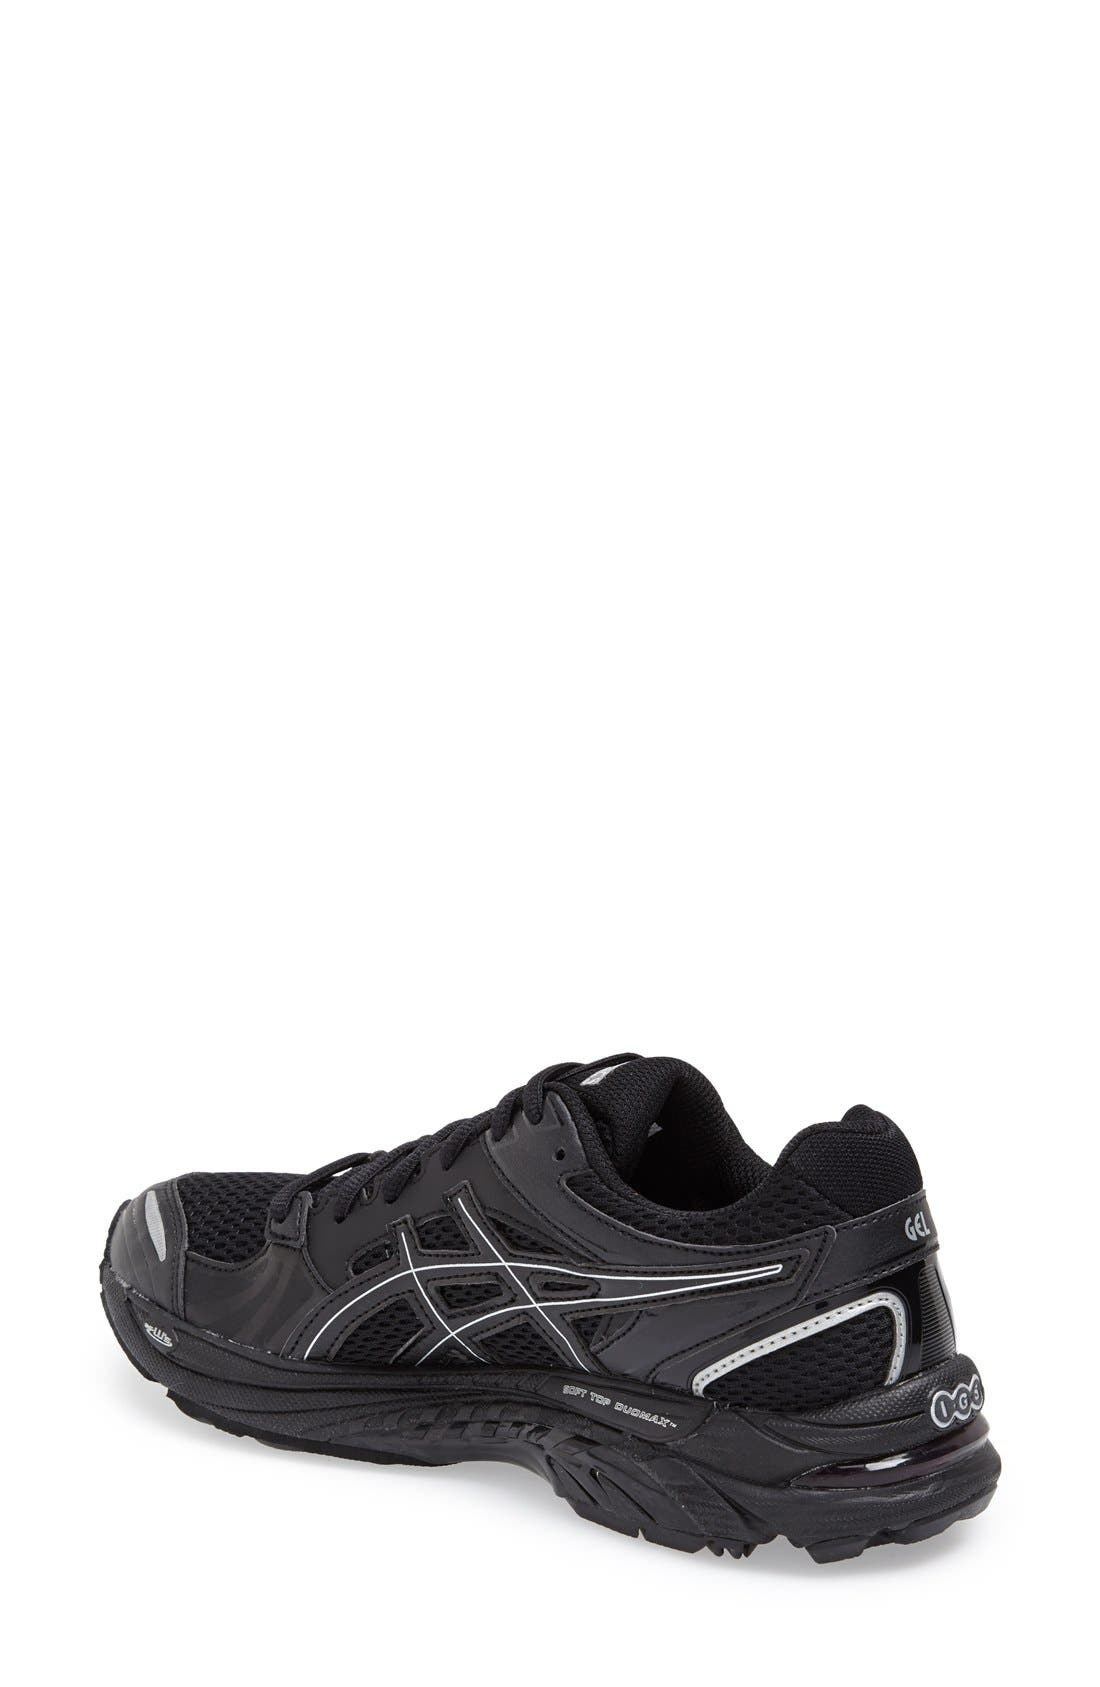 Alternate Image 2  - ASICS® 'GEL-Tech Neo 4' Walking Shoe (Women)